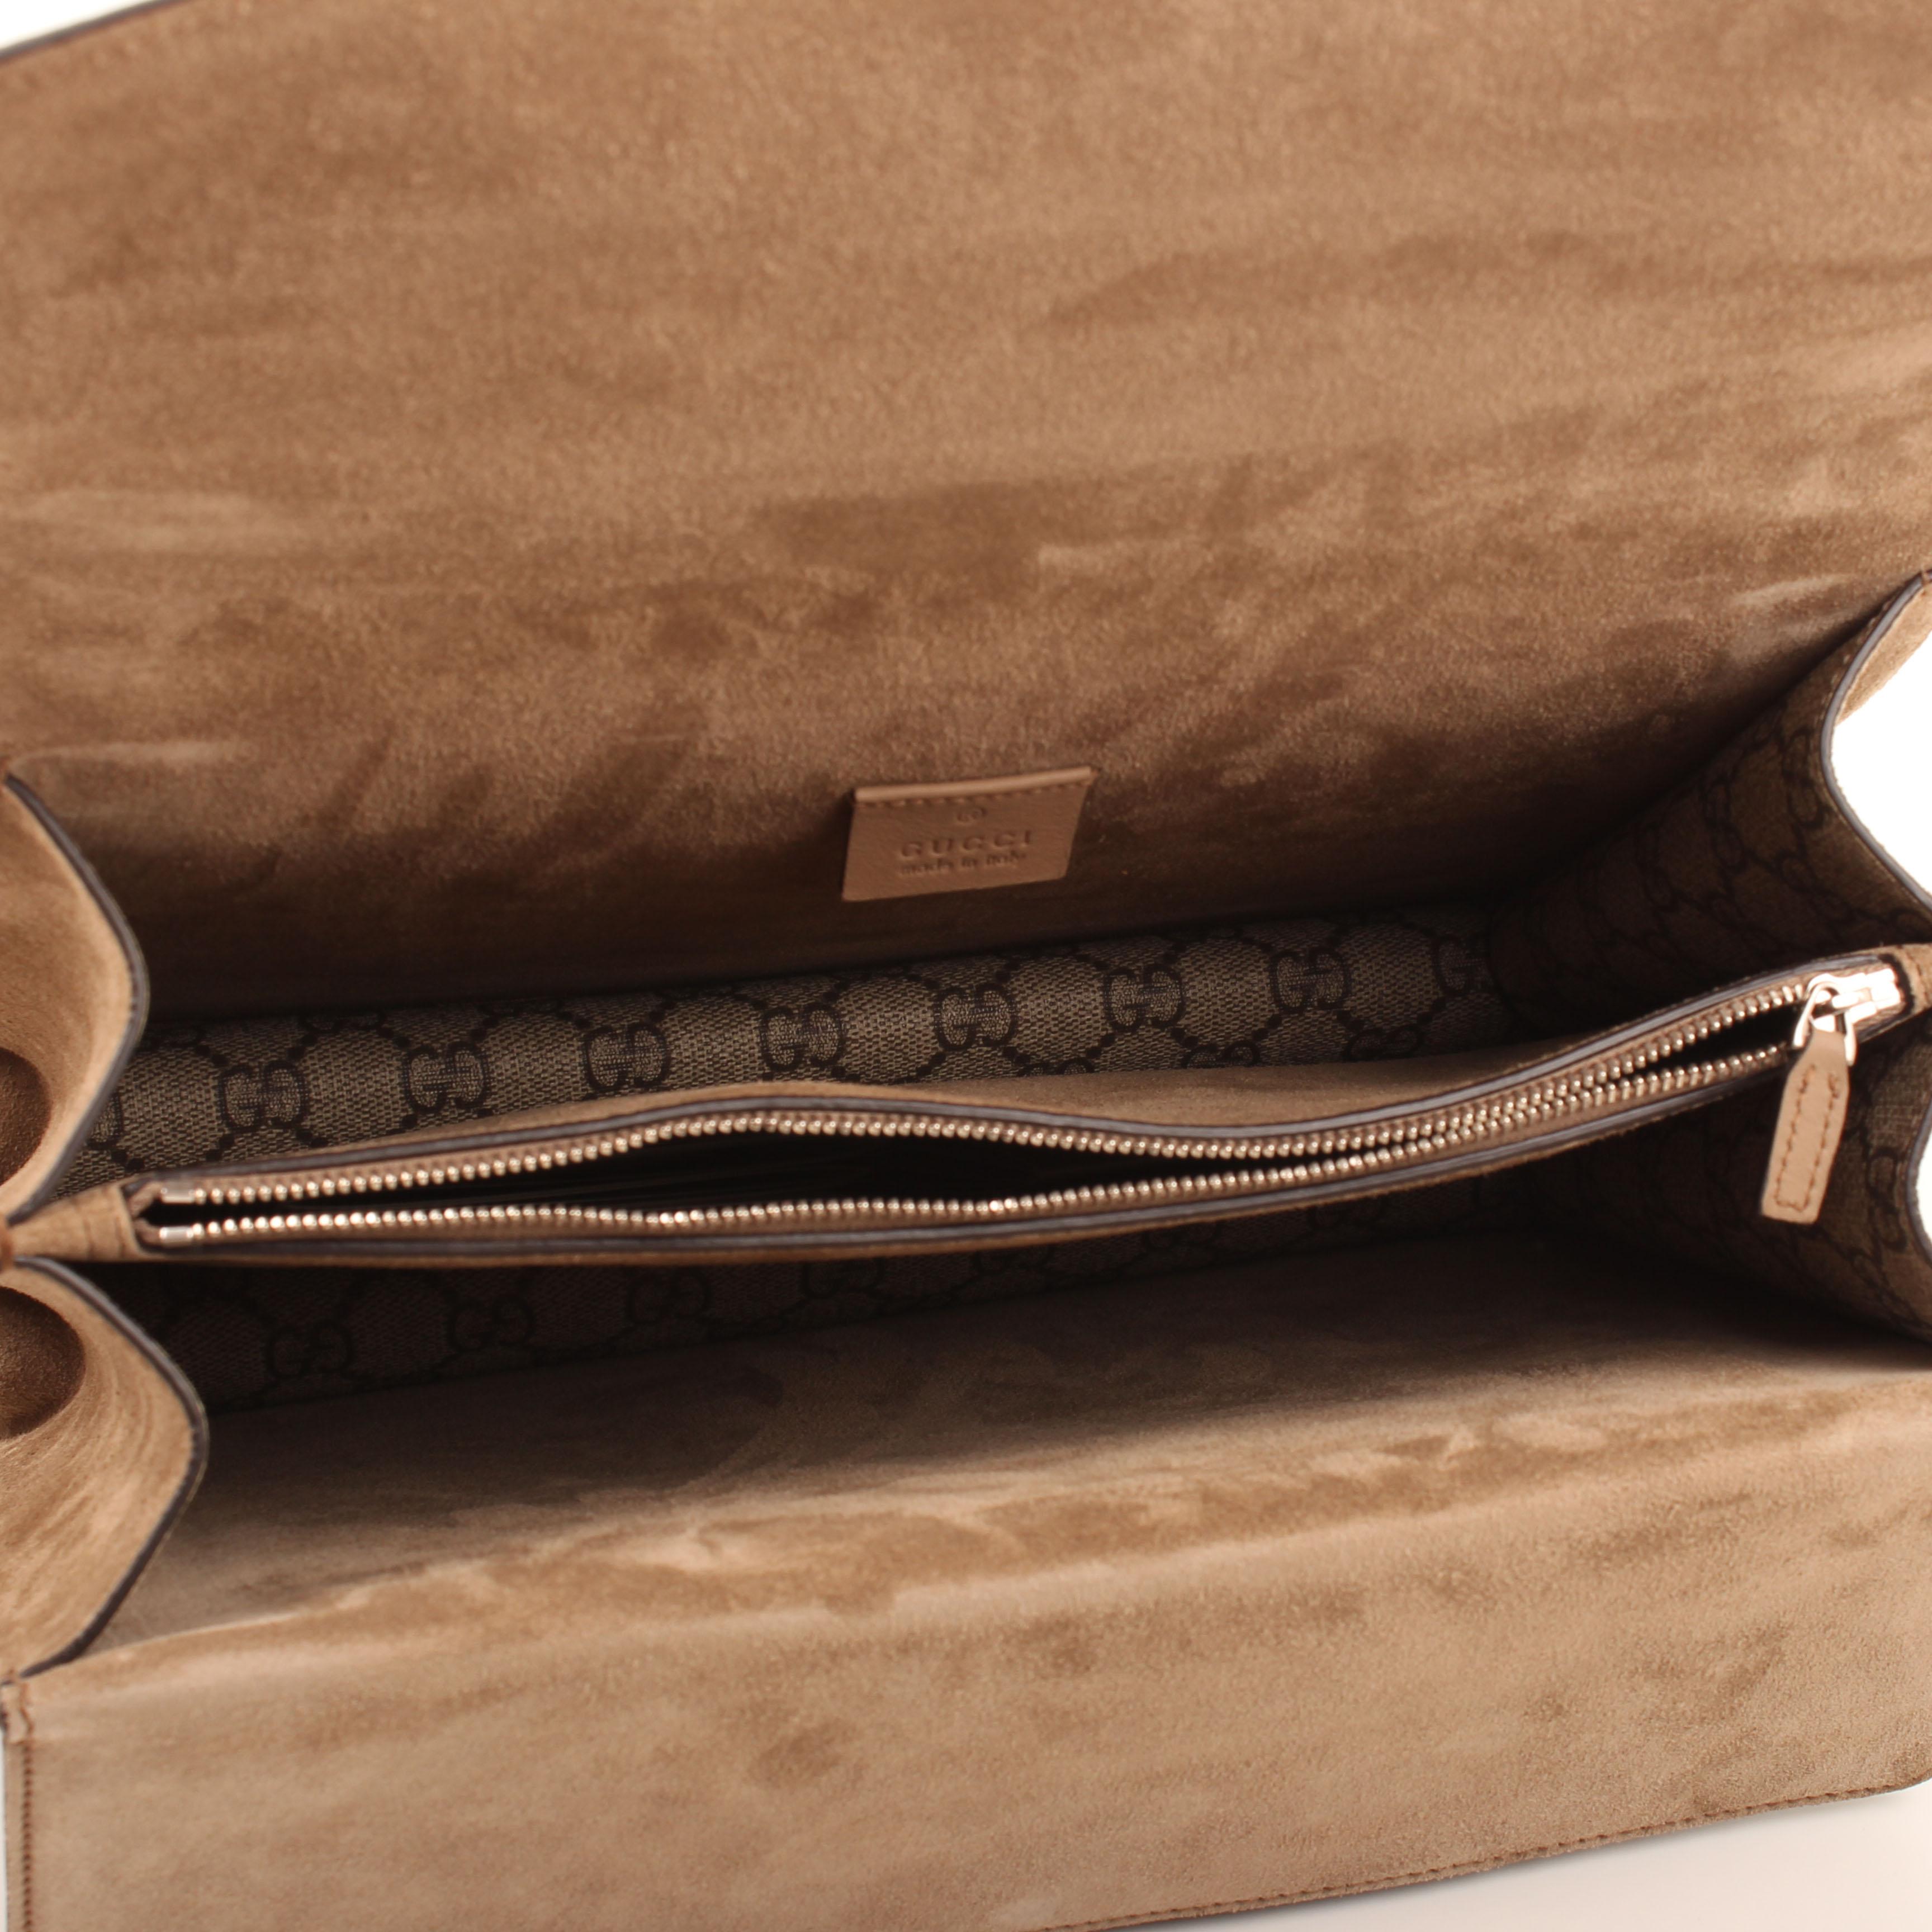 gucci shoulder bag dionysus embroidered rhinestones suede taupe gg supreme canvas interior